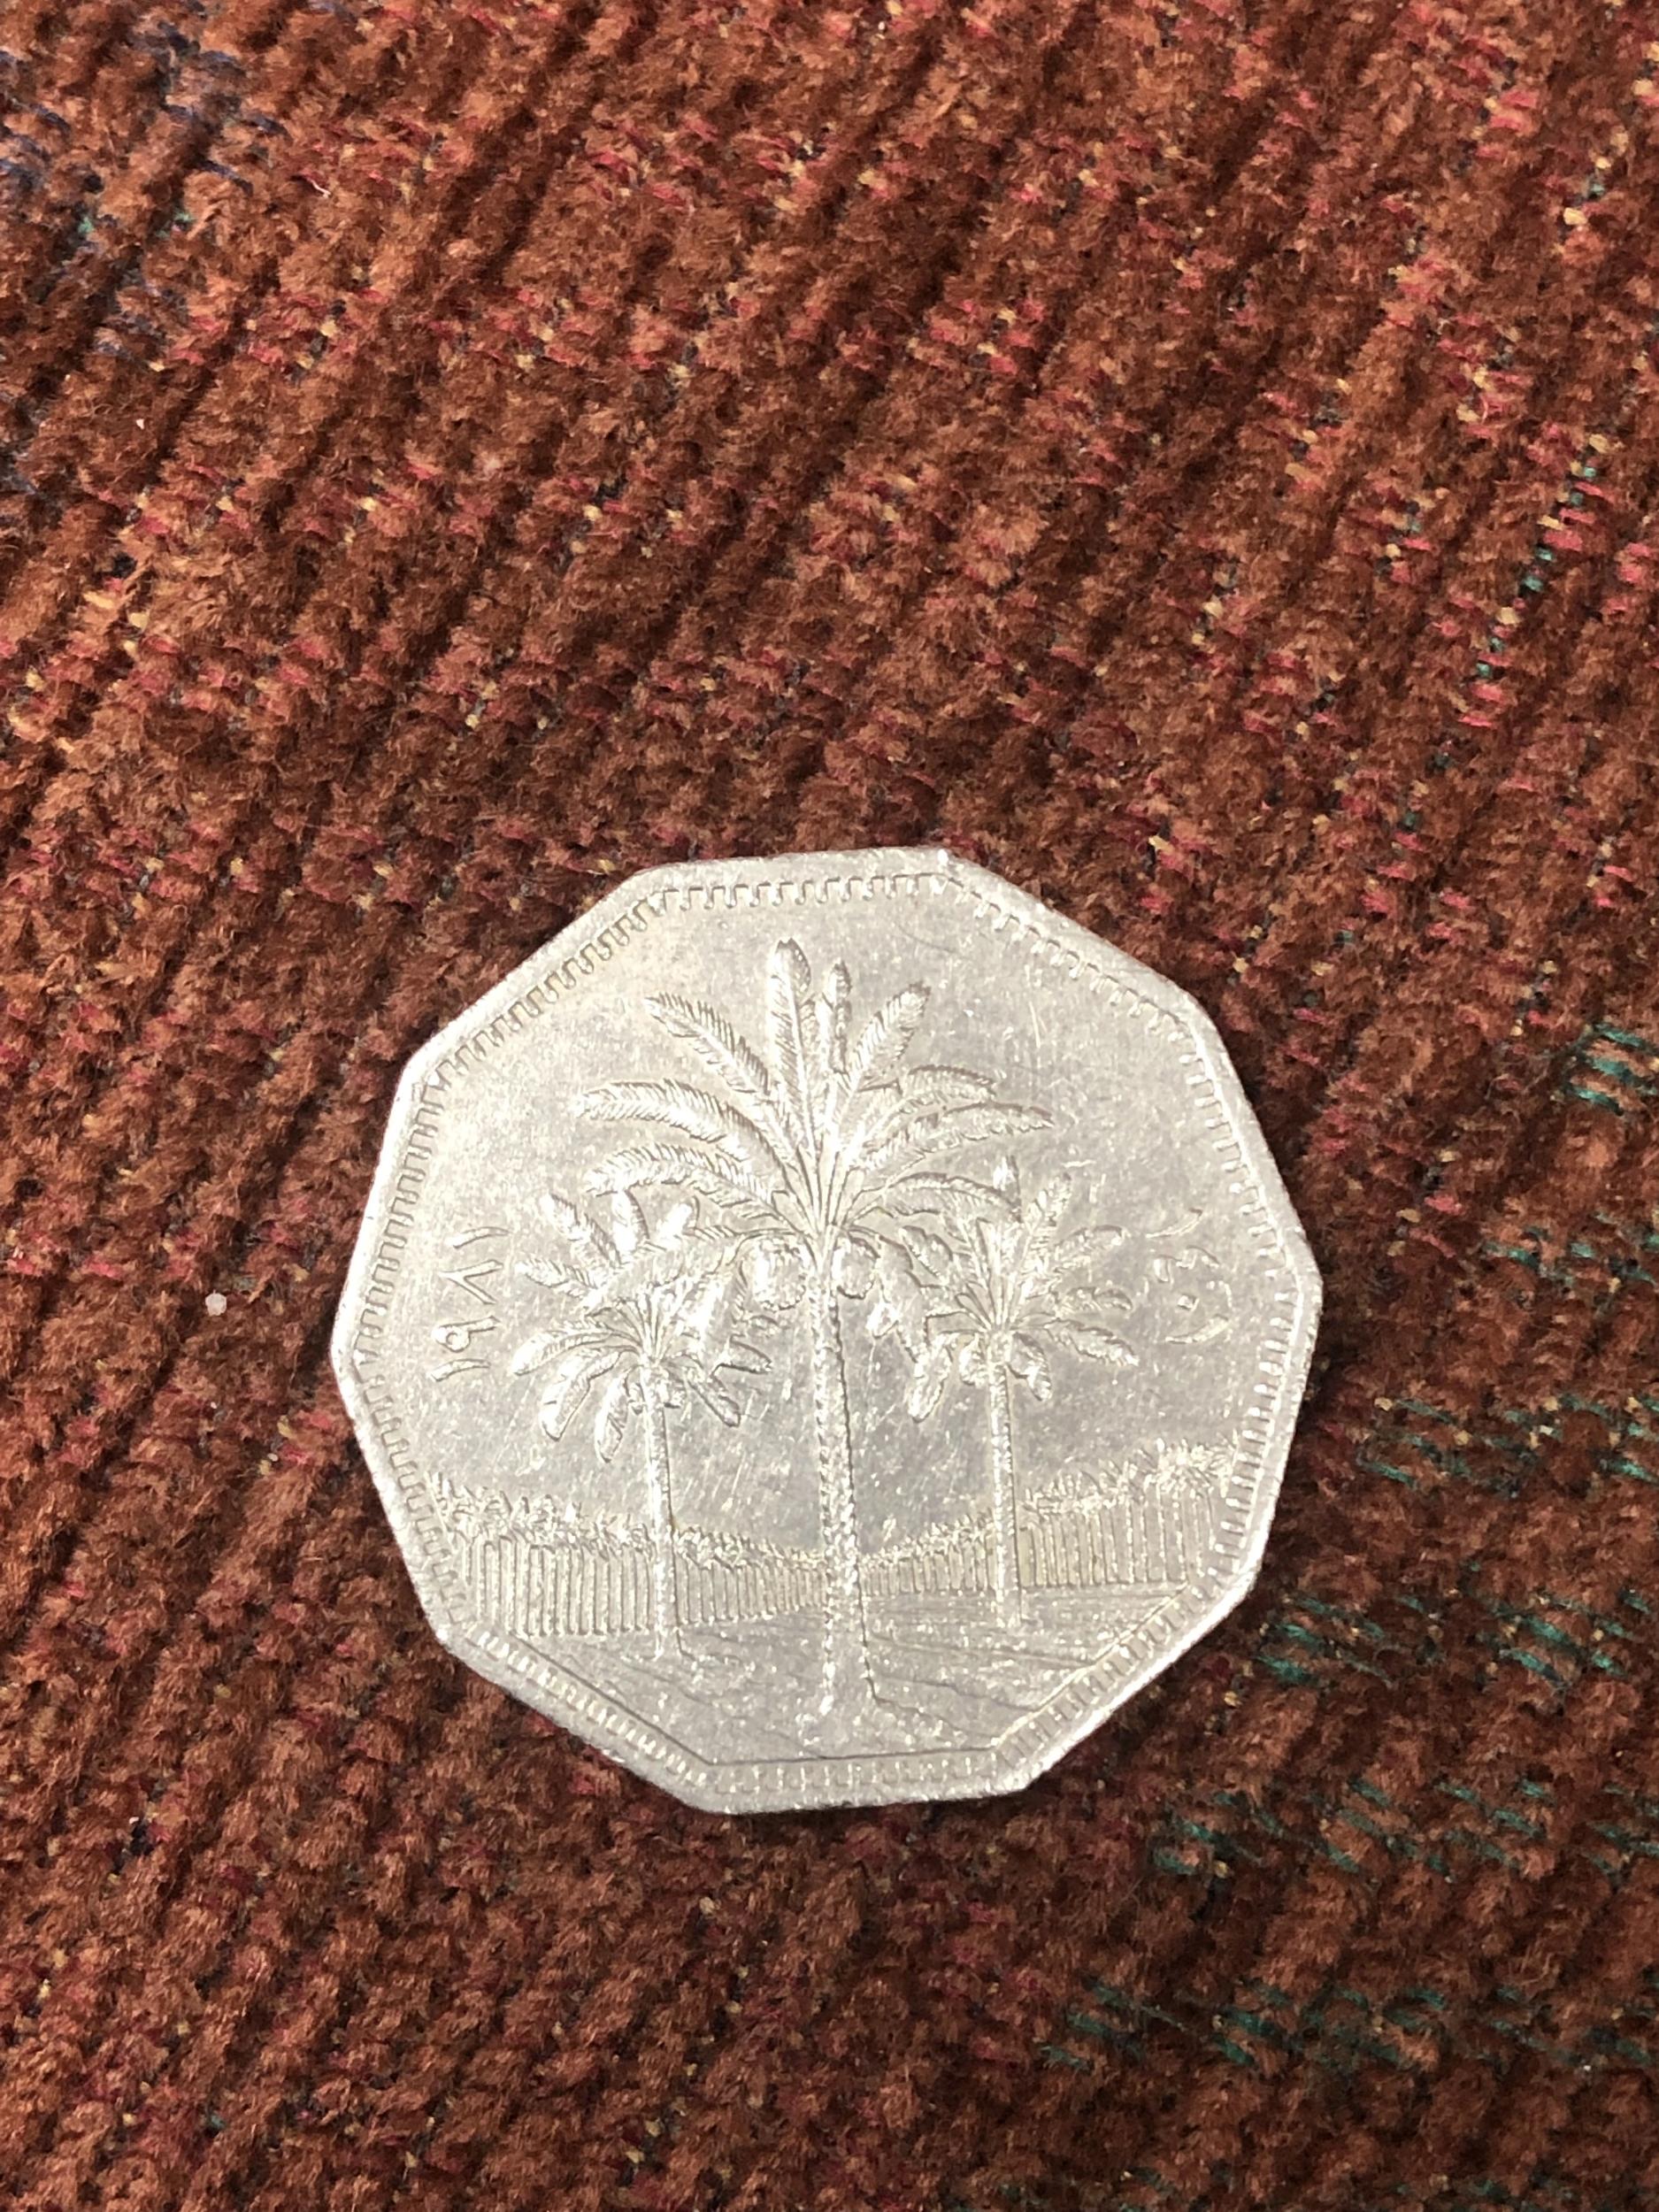 1981 Palm Tree Nickel Coin Saddam Hussein Era.Km#170 .العراق Iraq 1 Dinar